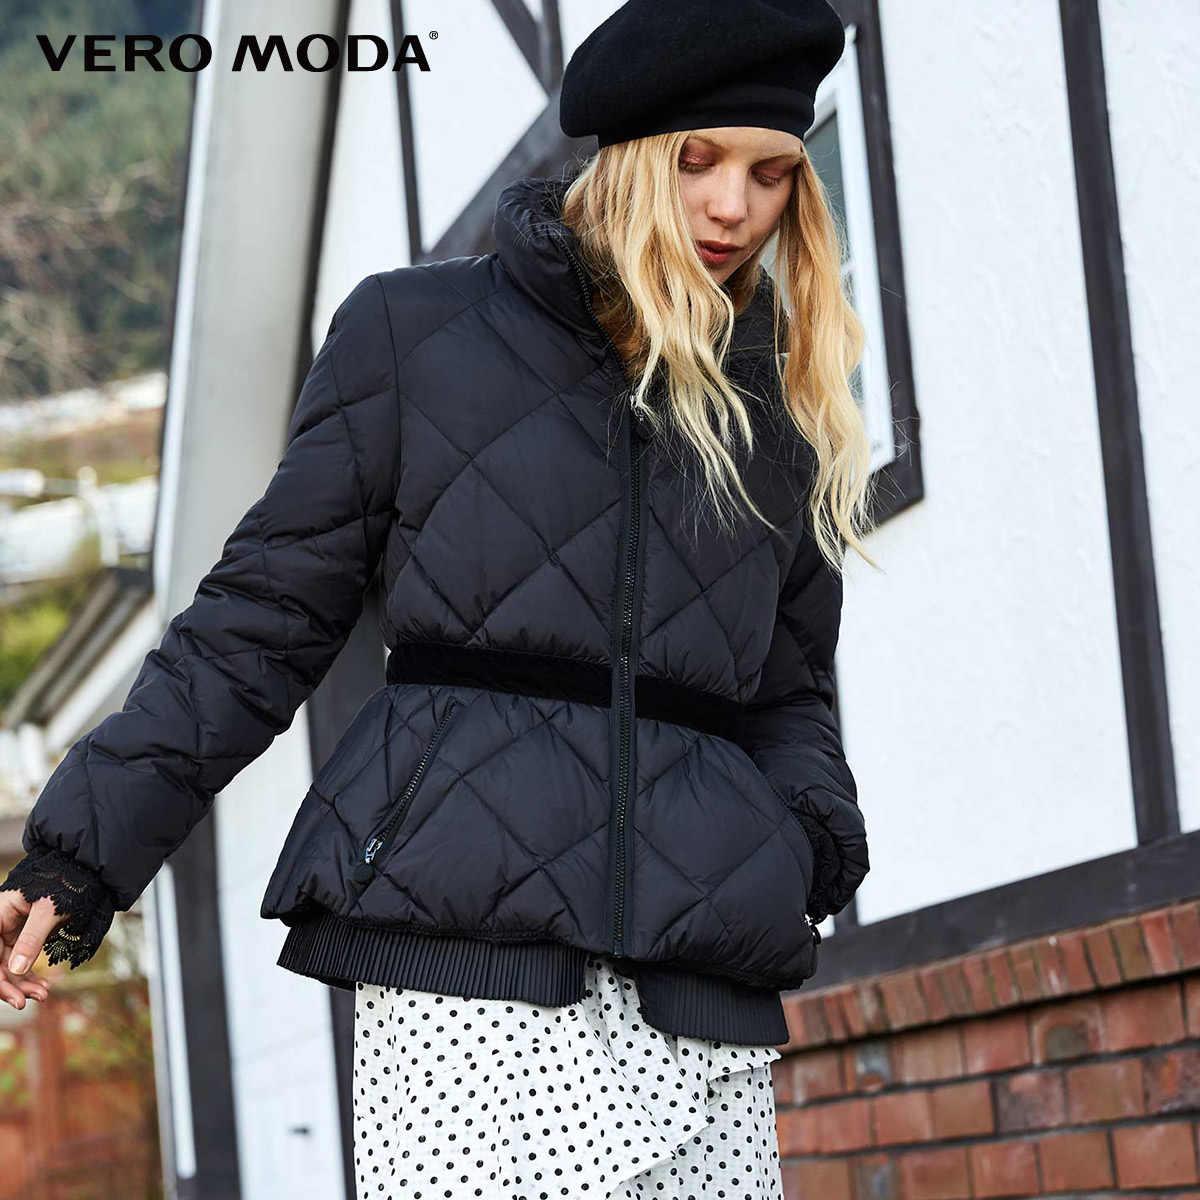 Vero Moda новая Талия 90% белая утка короткий пуховик для женщин | 318423529